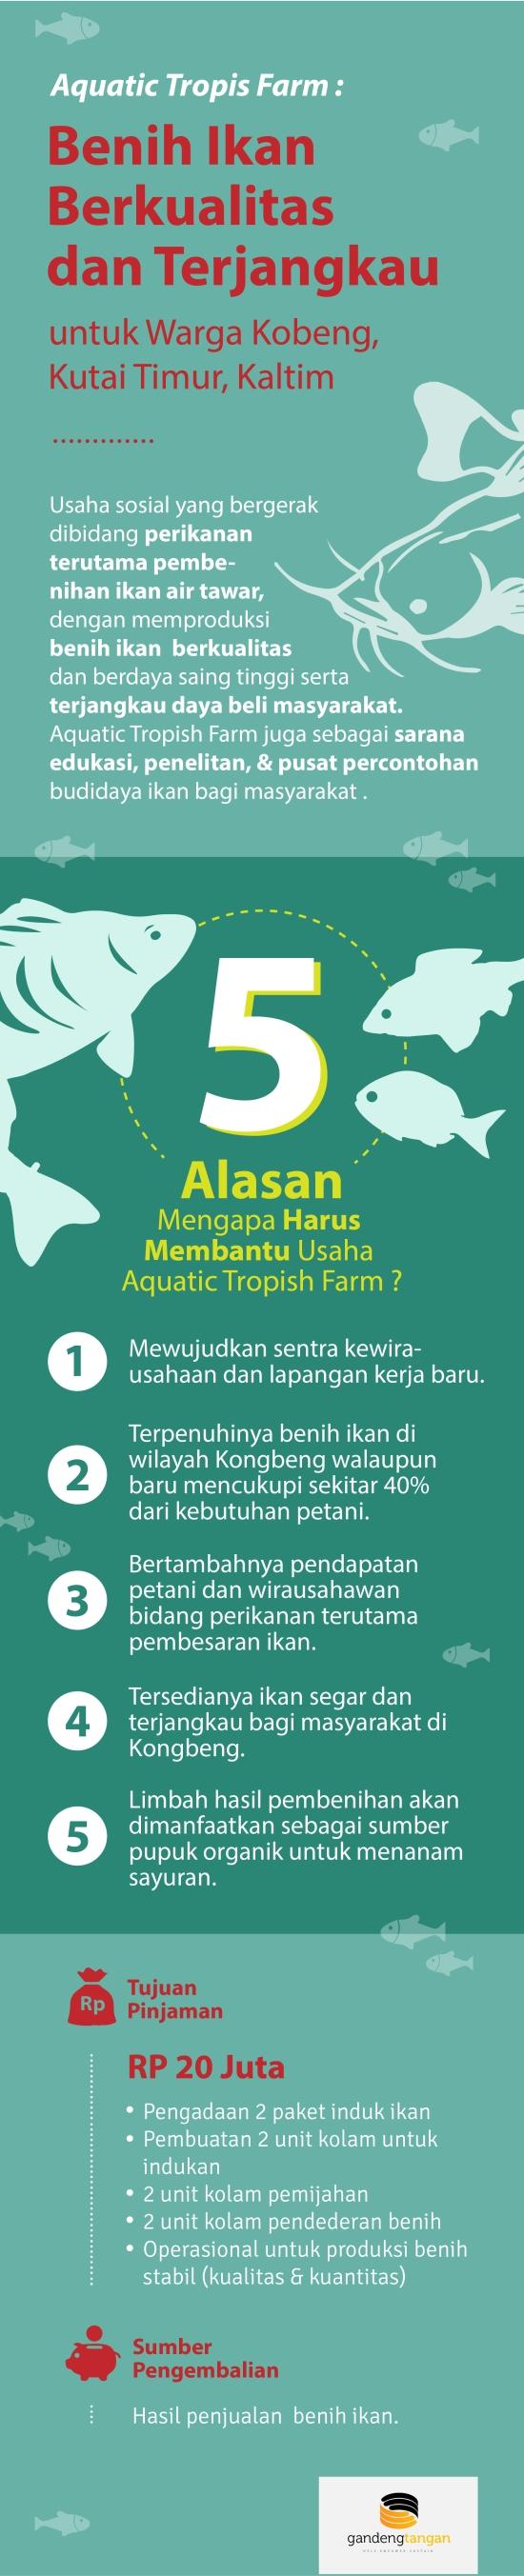 2016-03-03-04-16-infografis-aquatic-01.jpg